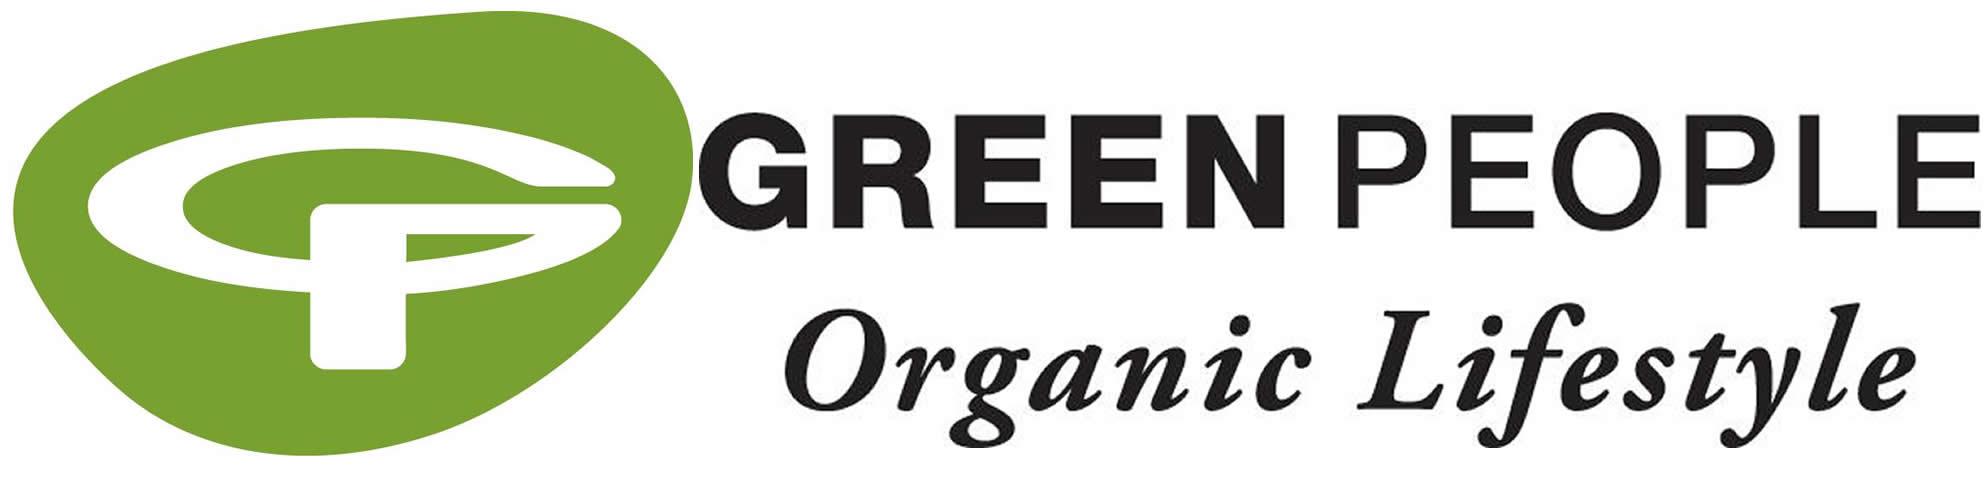 green people logo 2